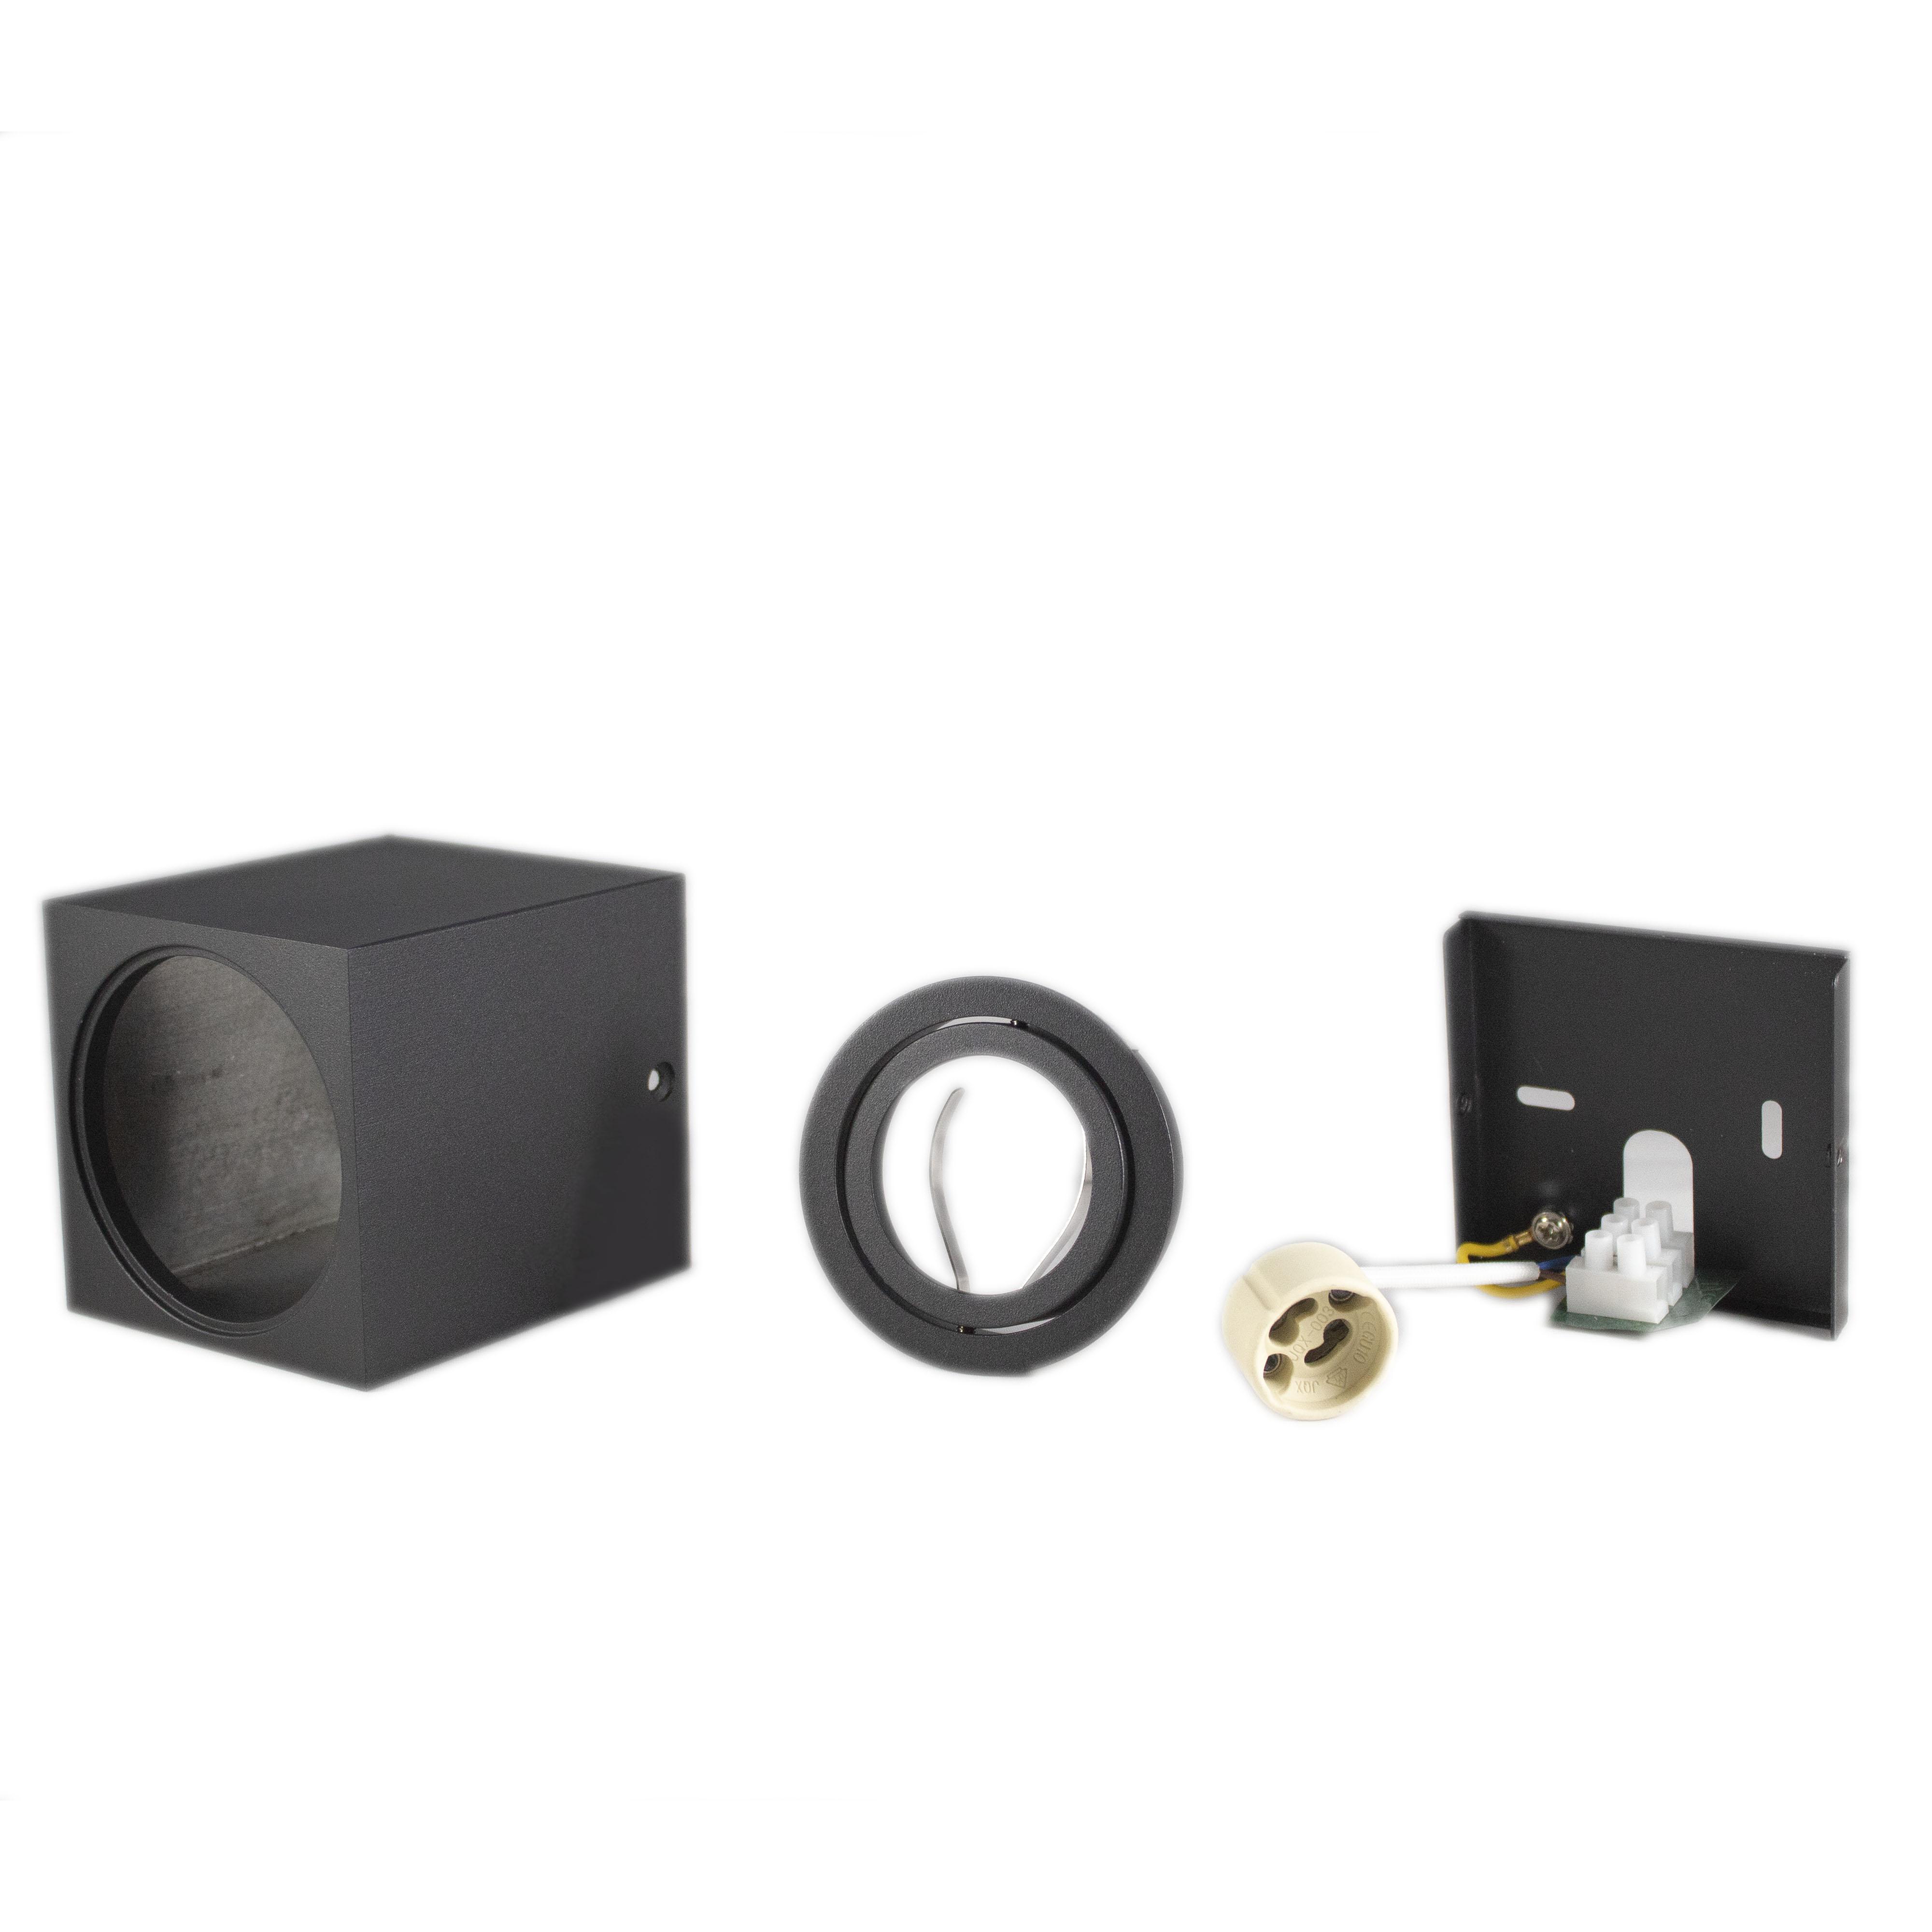 Opbouw spot armatuur zwart vierkant kantelbaar GU10 fitting - onderdelen bundel